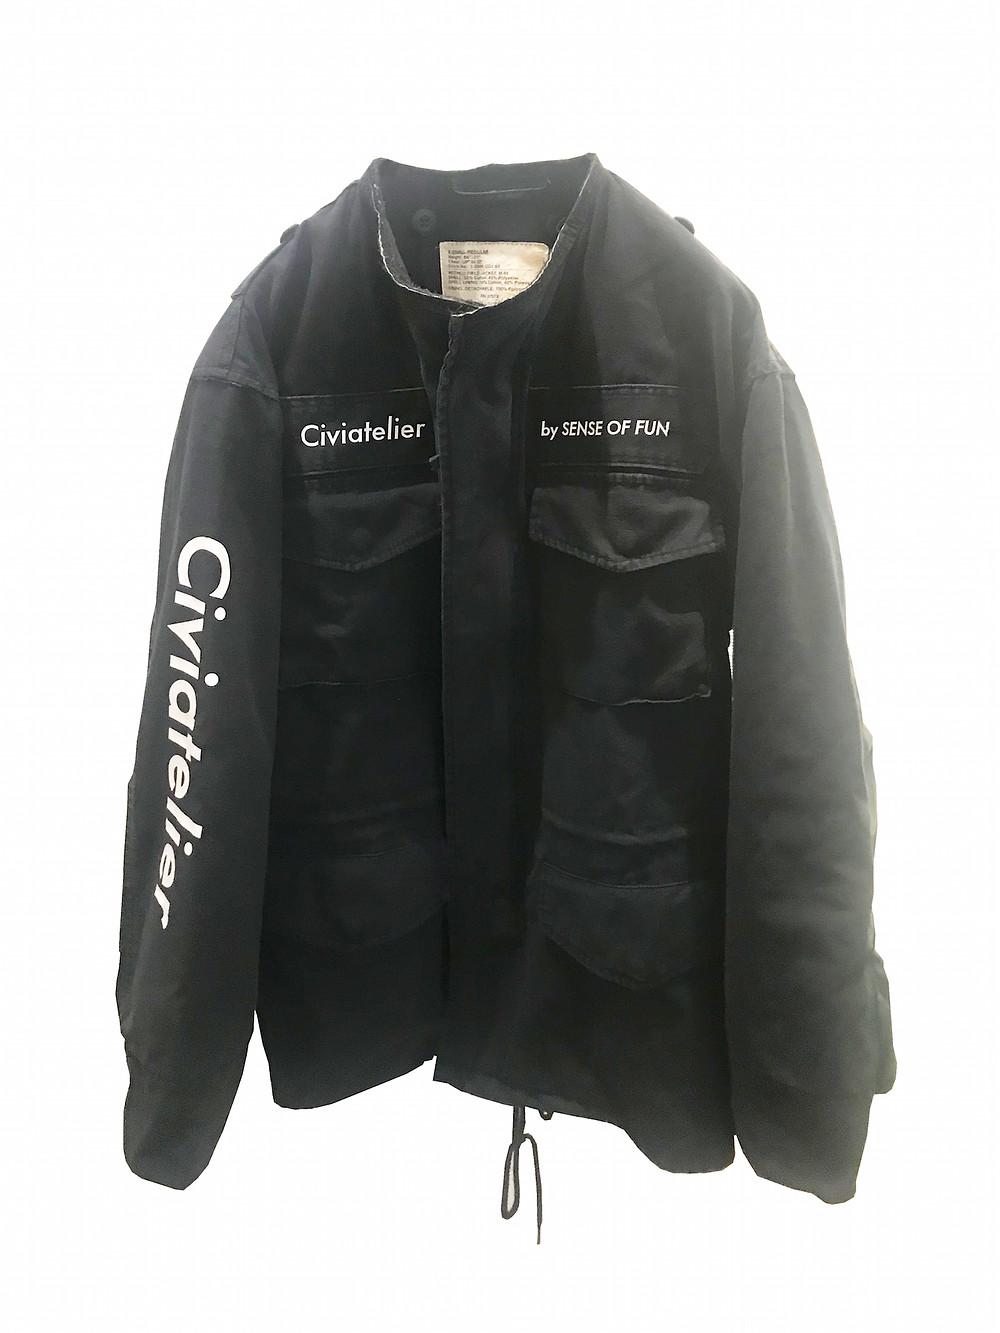 Civiatelier Remake Rothco Jacket